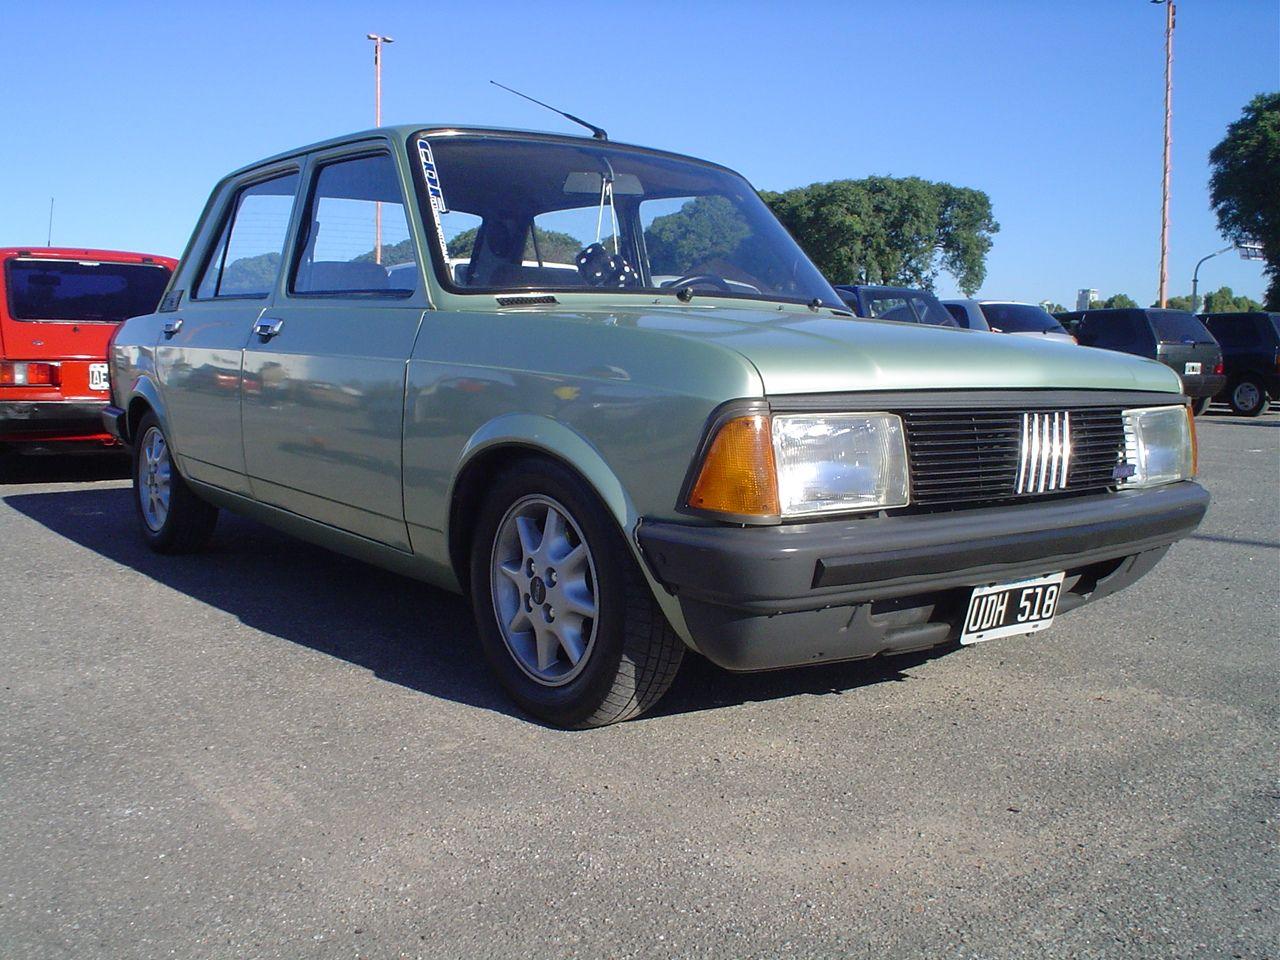 Fiat 128 Super Europa Fiat 128 Autos Y Coches